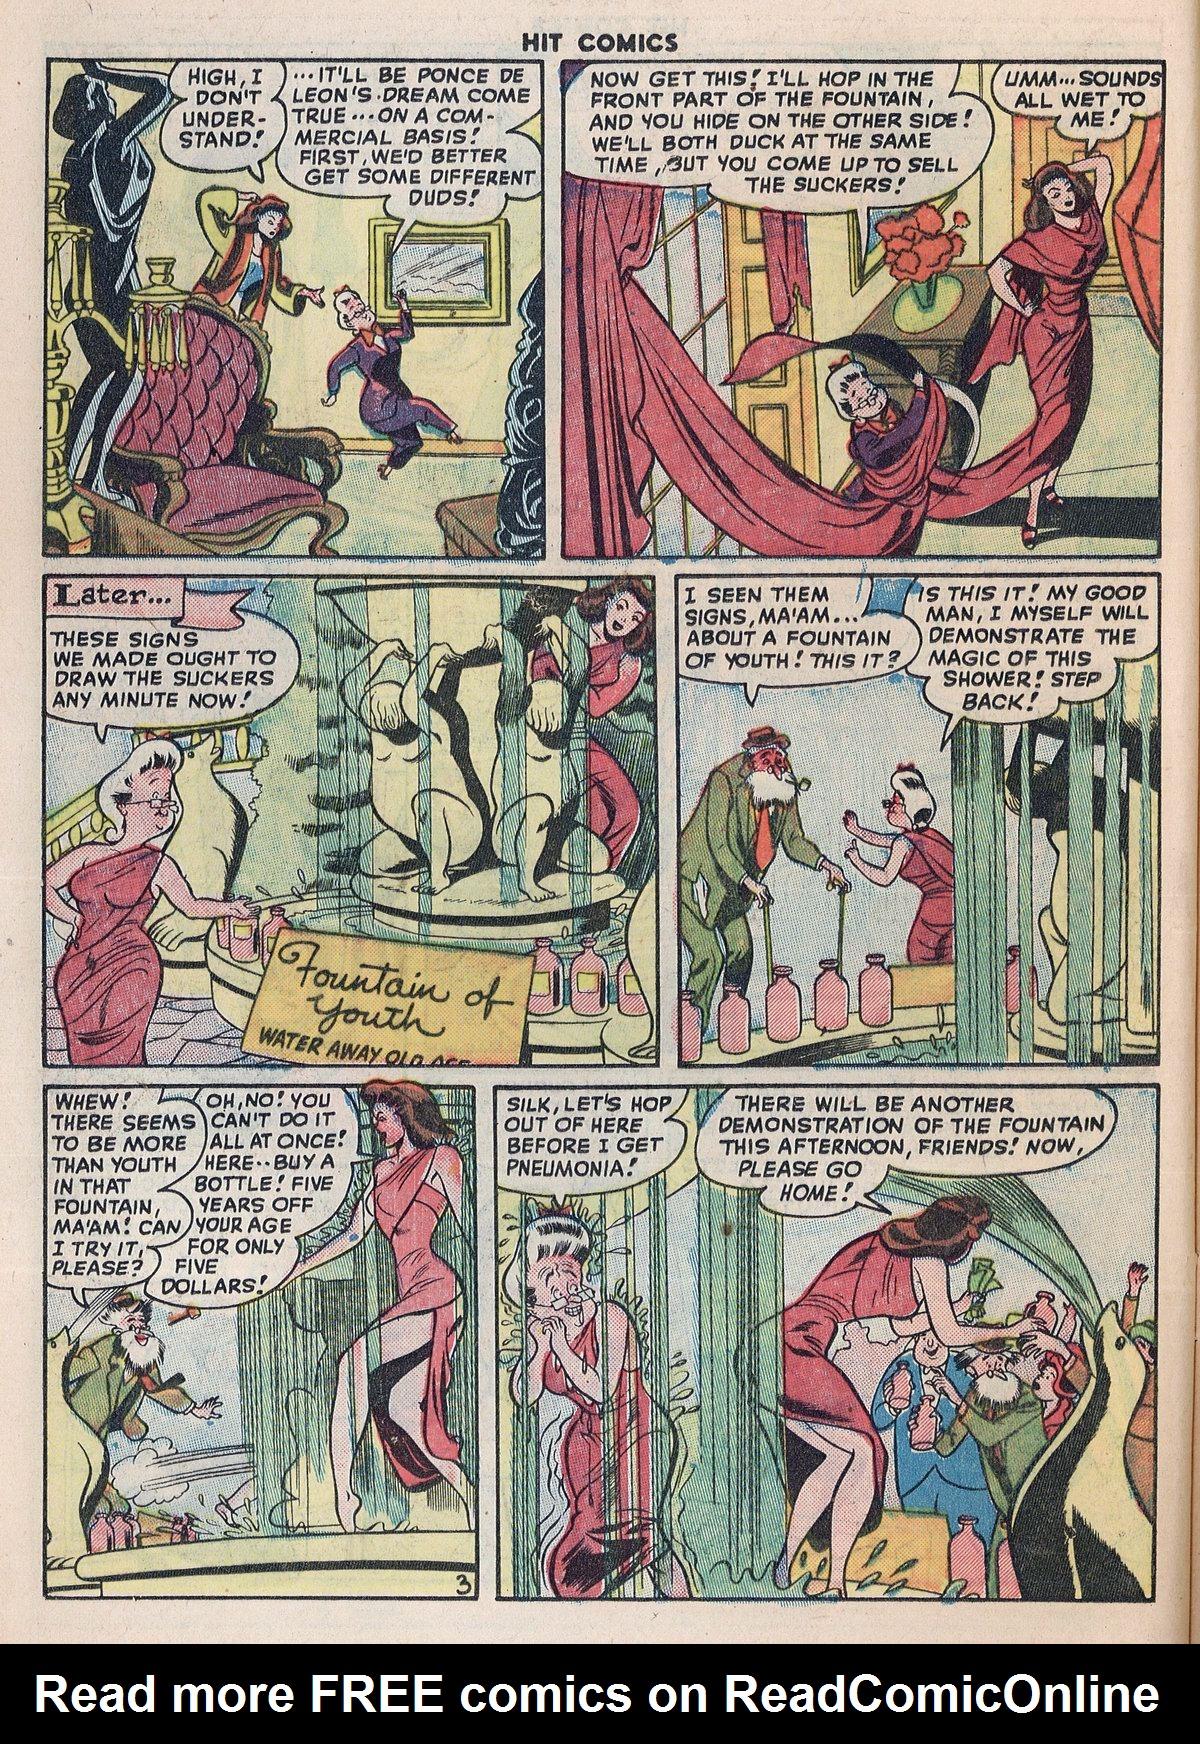 Read online Hit Comics comic -  Issue #55 - 18